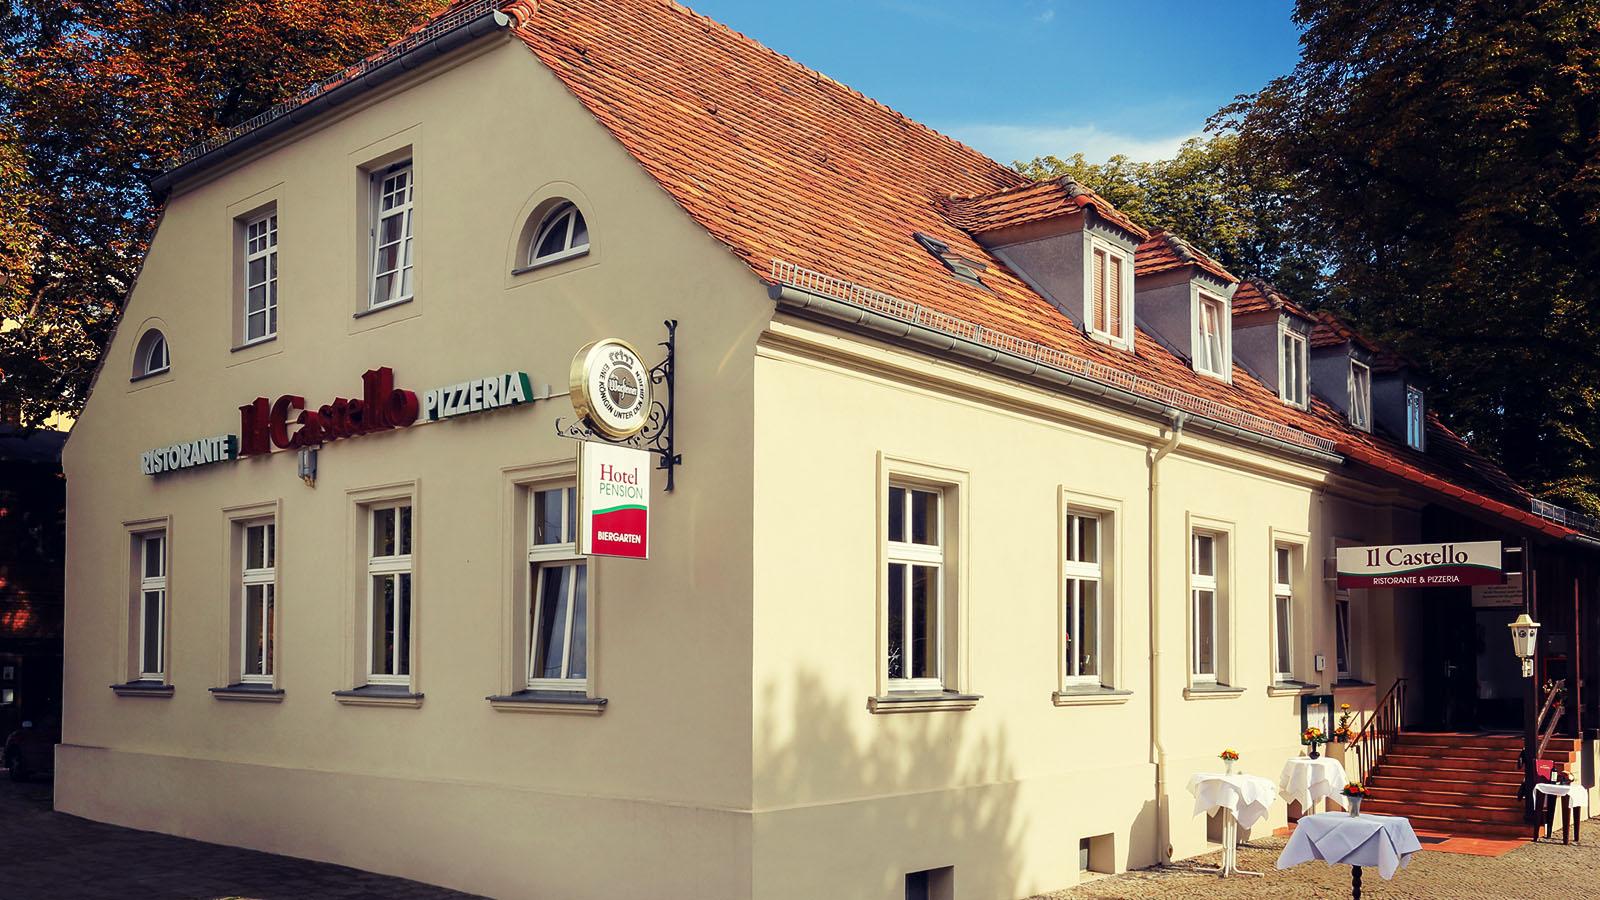 il-castello-berlin-buch-restaurant-eventlocation-pension-sllider1